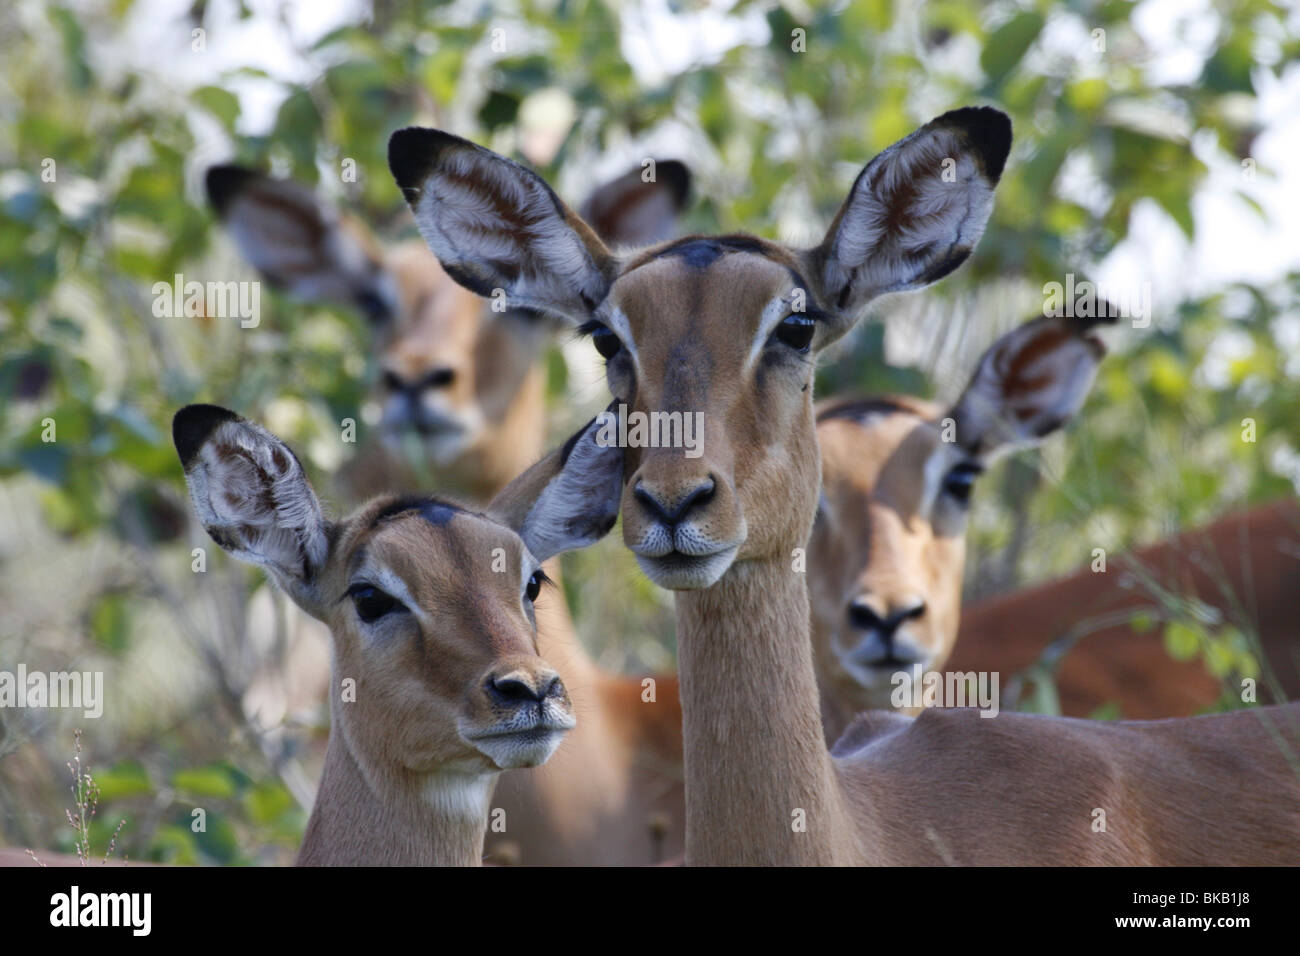 impala, kruger, south, africa - Stock Image